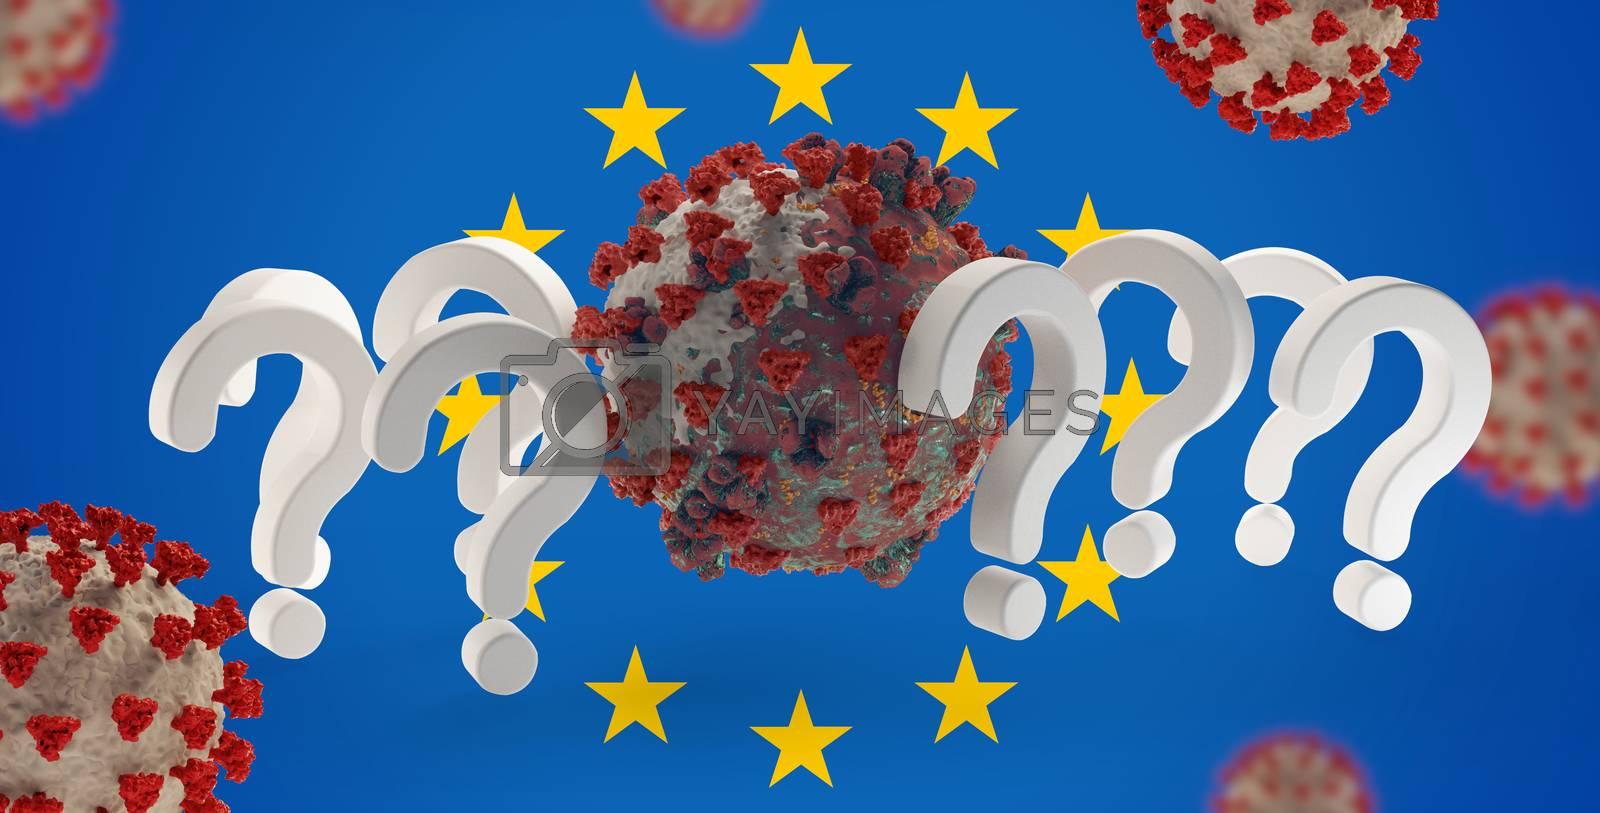 question marks Europe Coronavirus Covid-19 symbolic 3d-illustration